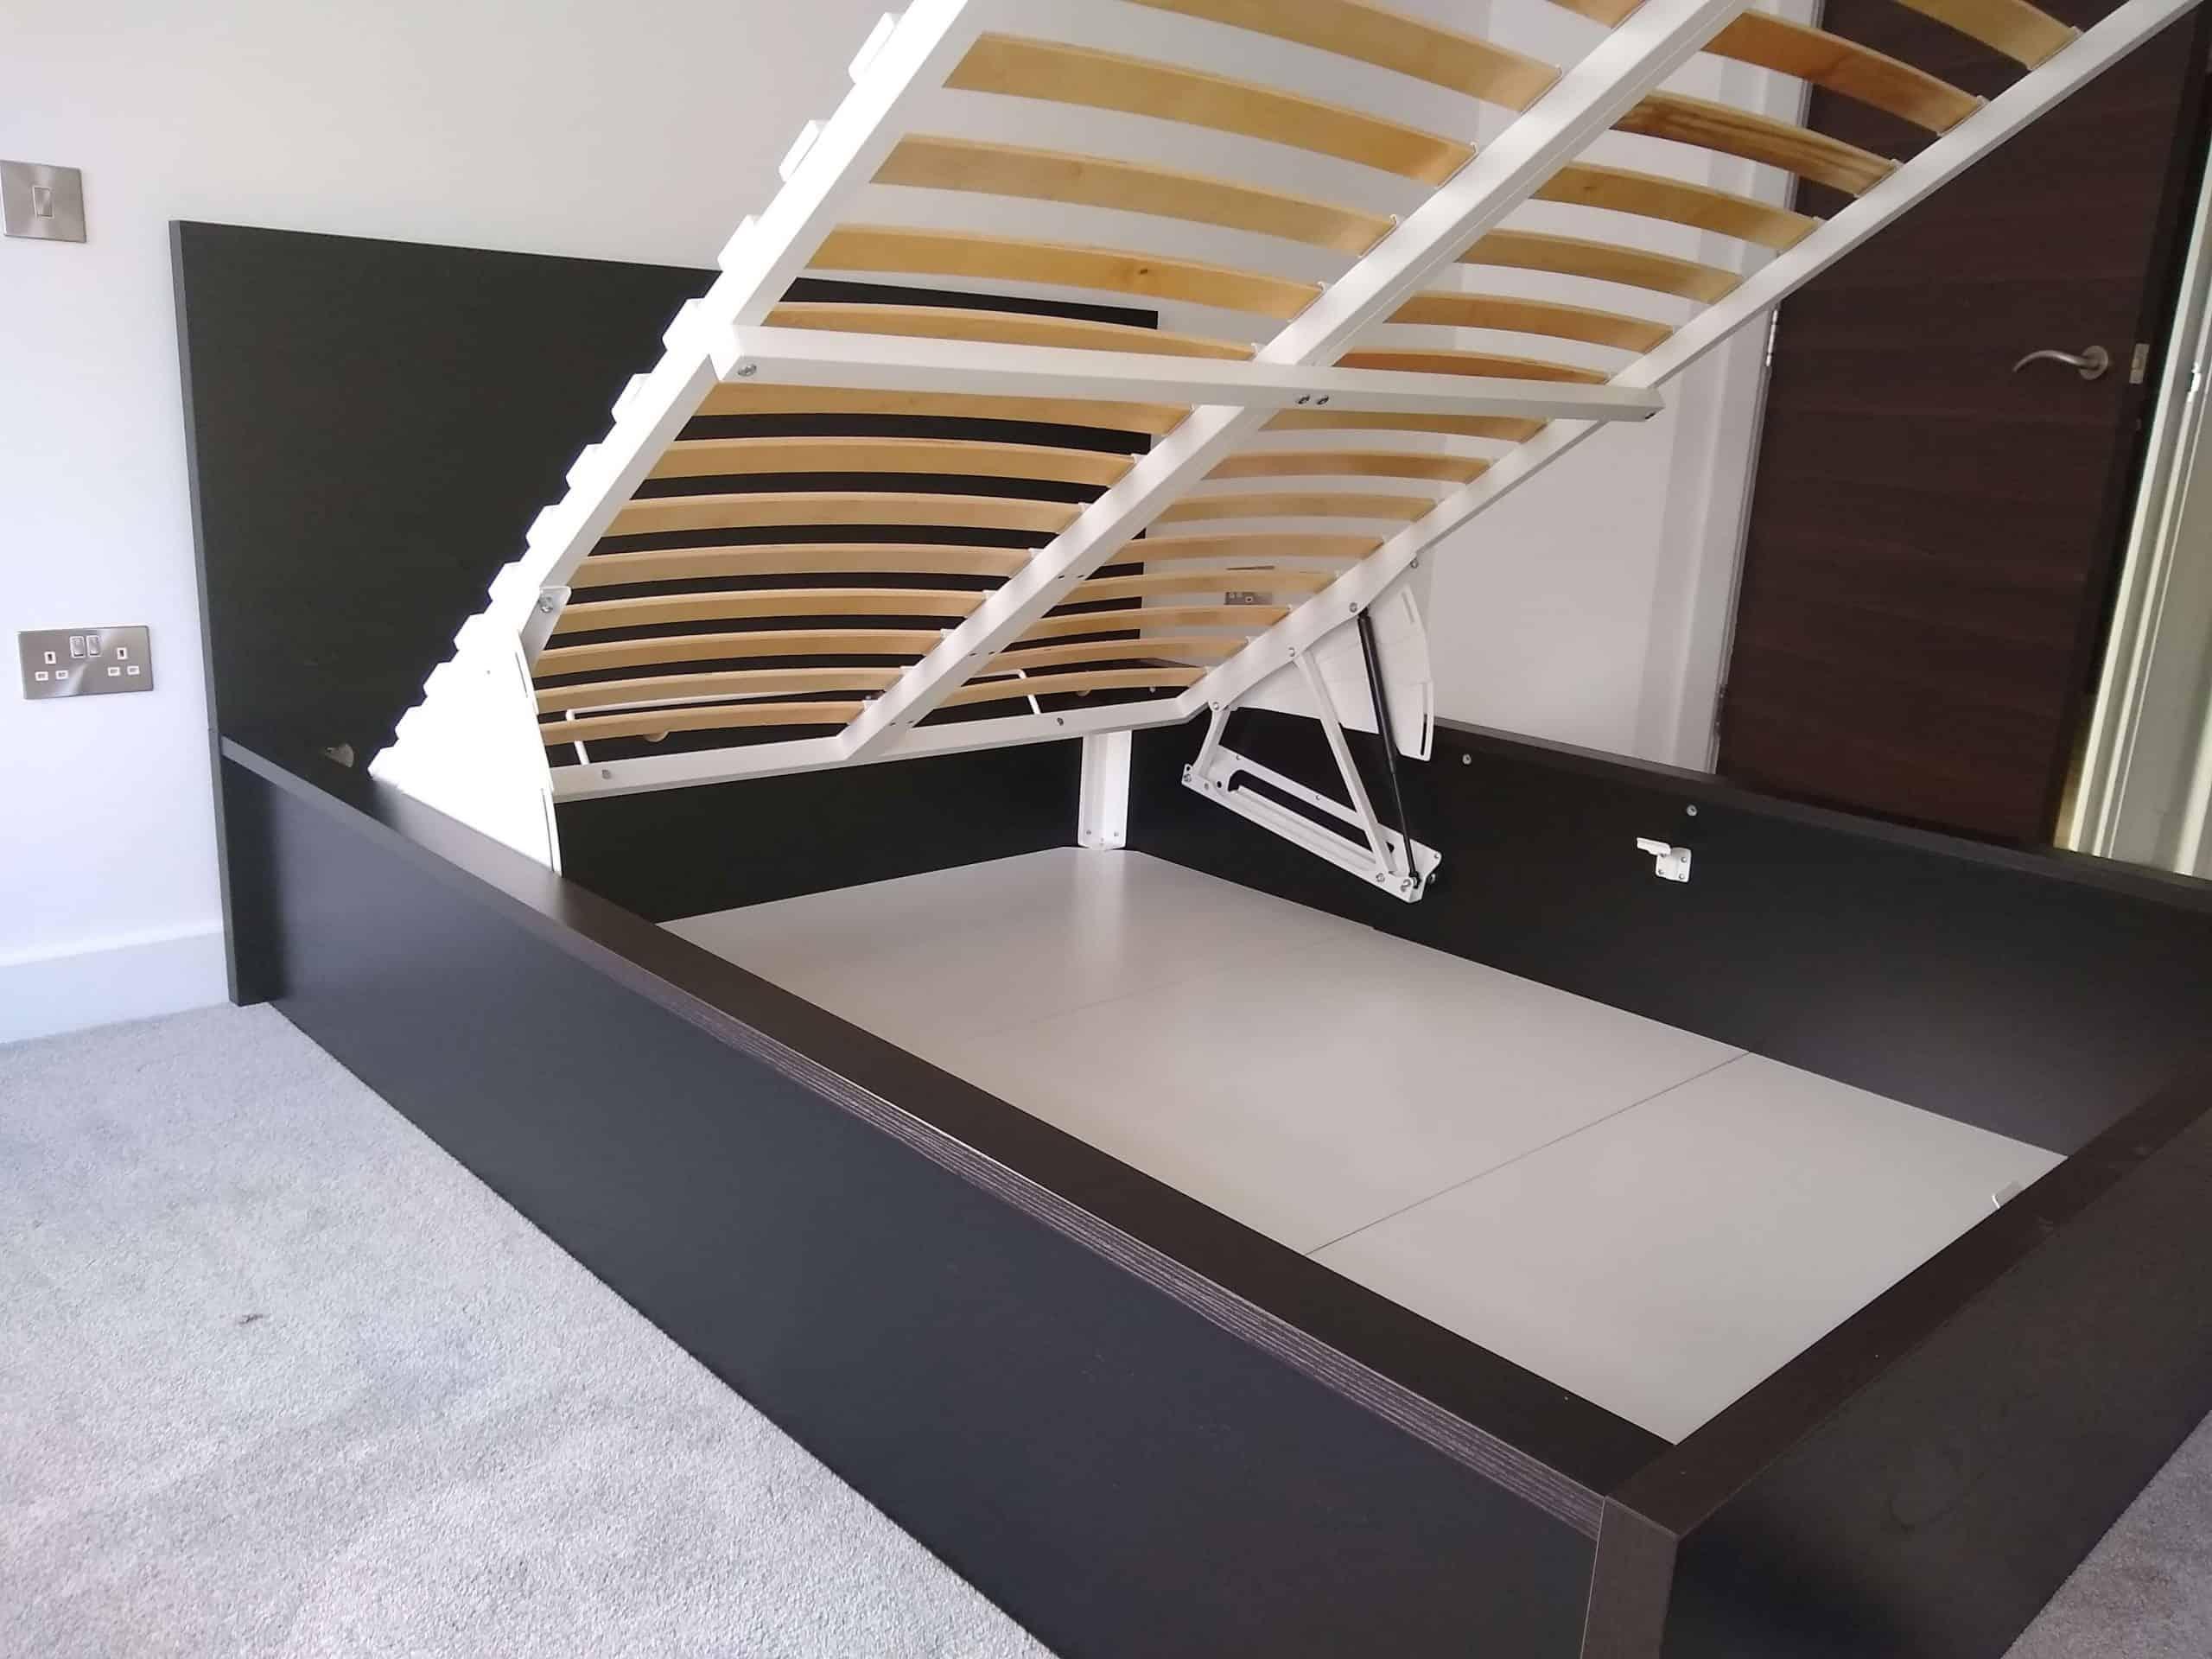 Flat pack furniture assembly horsham